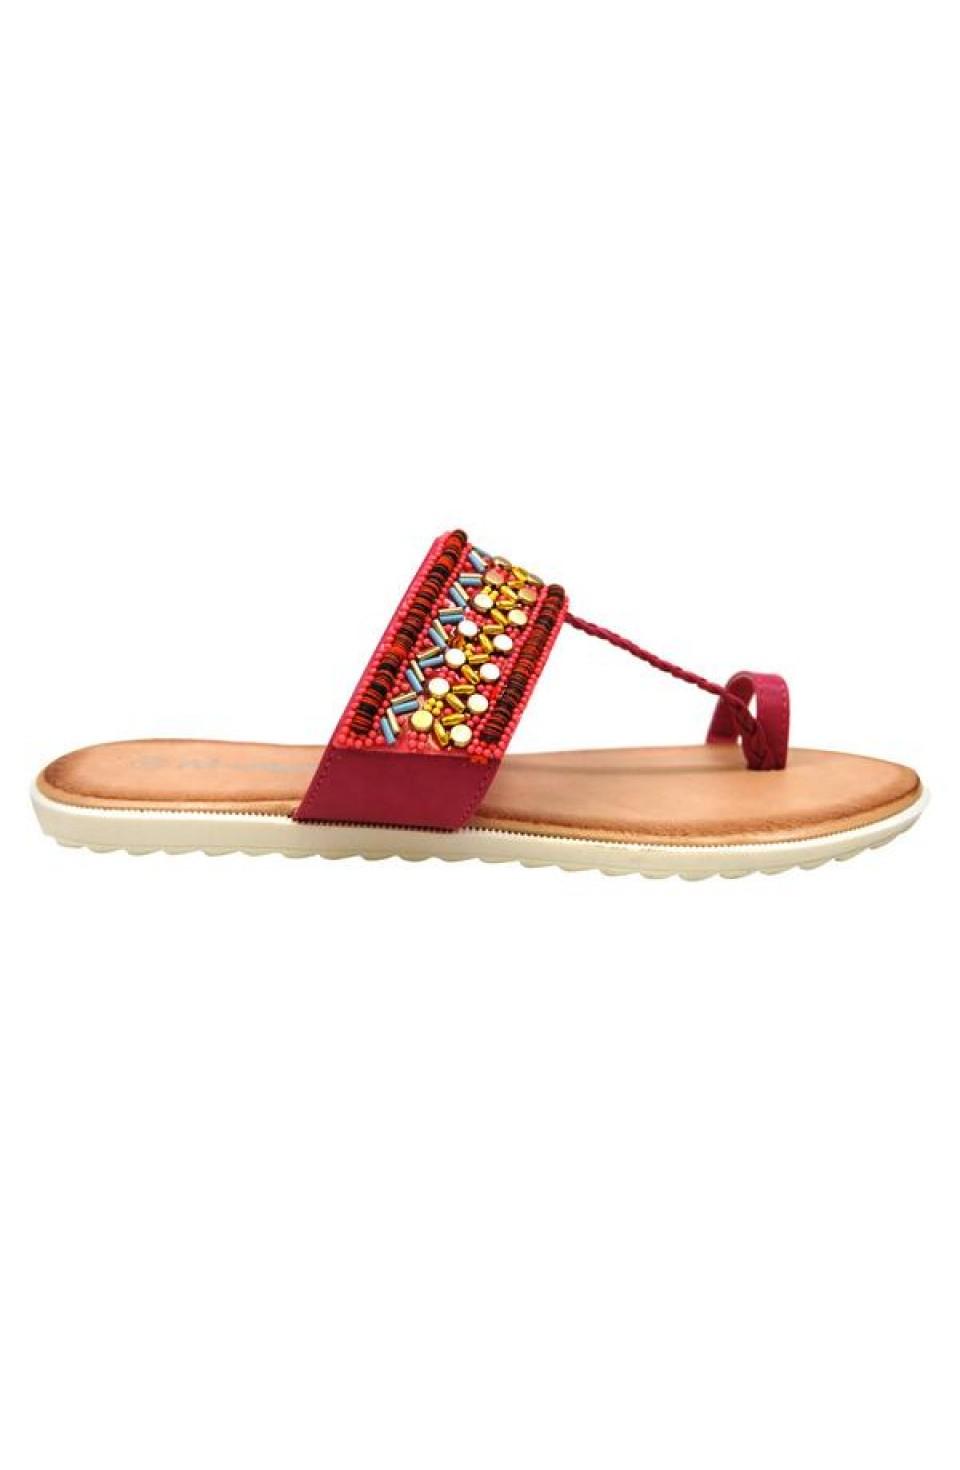 Women's Fuchsia Manmade Roebella Toe Ring Sandal with Gorgeous Beaded Strap